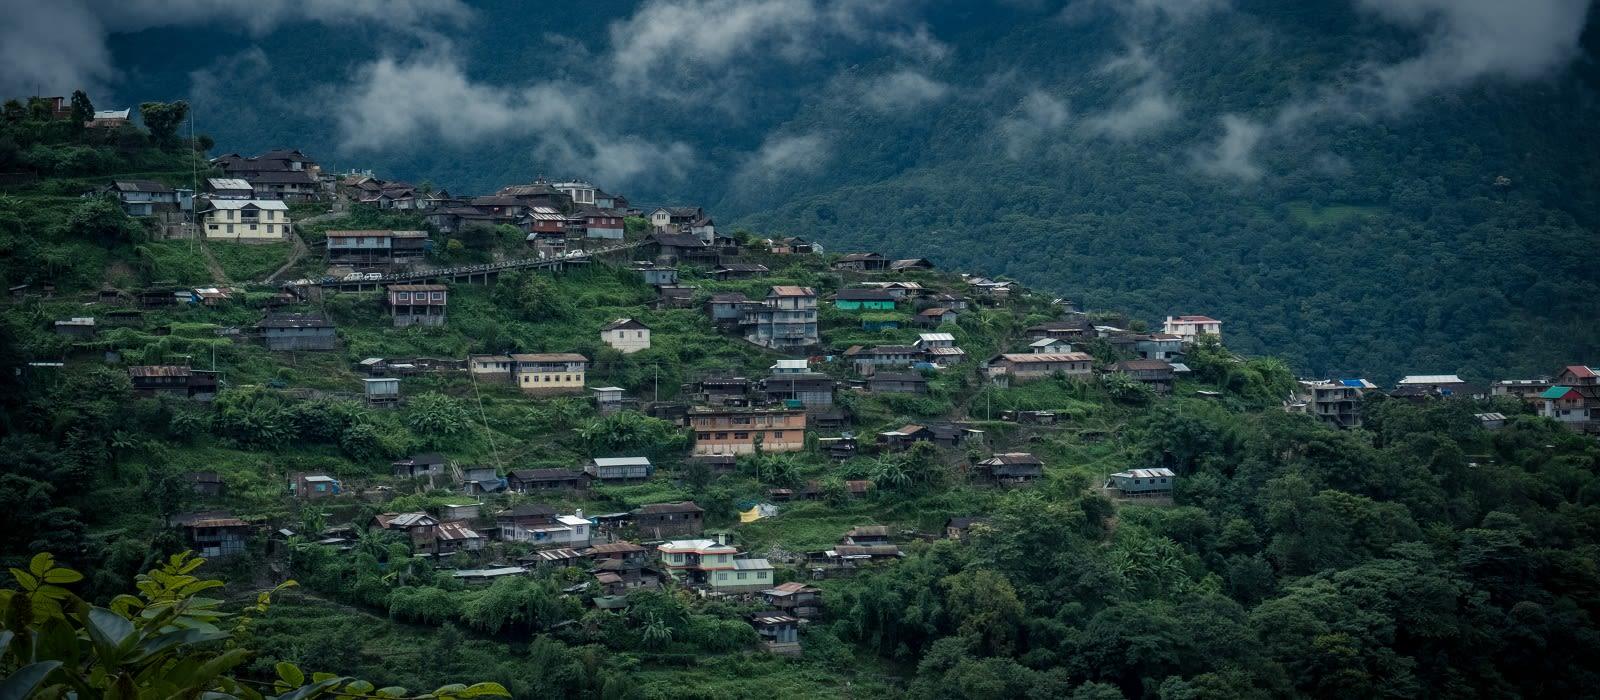 Eastern Gems, Landscapes and Culture Tour Trip 5